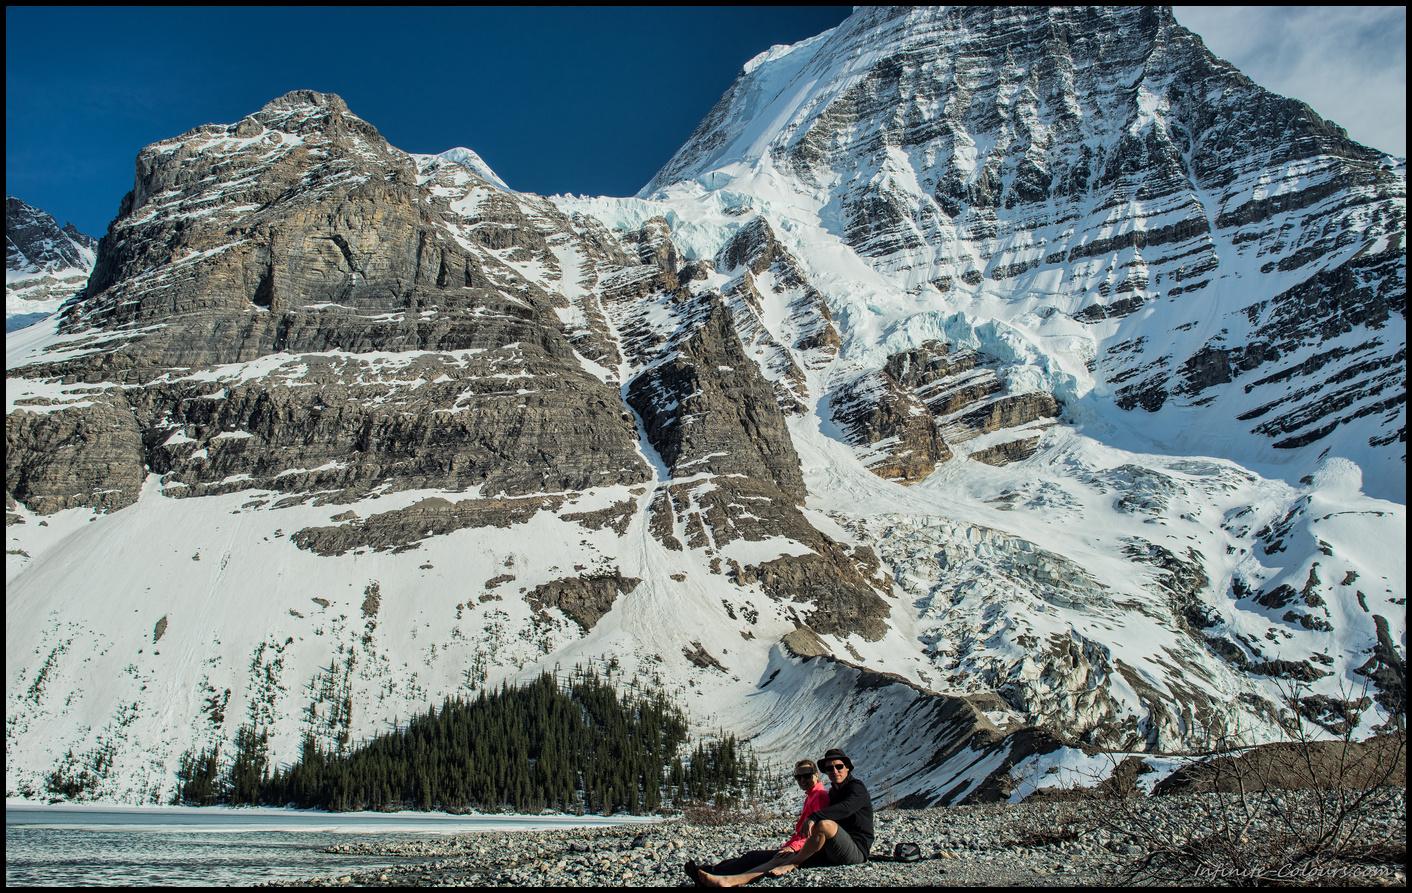 Enjoying a private Berg lake beach at Marmot campsite, Sony A7 / Canon FD Tilt Shift 35 2.8